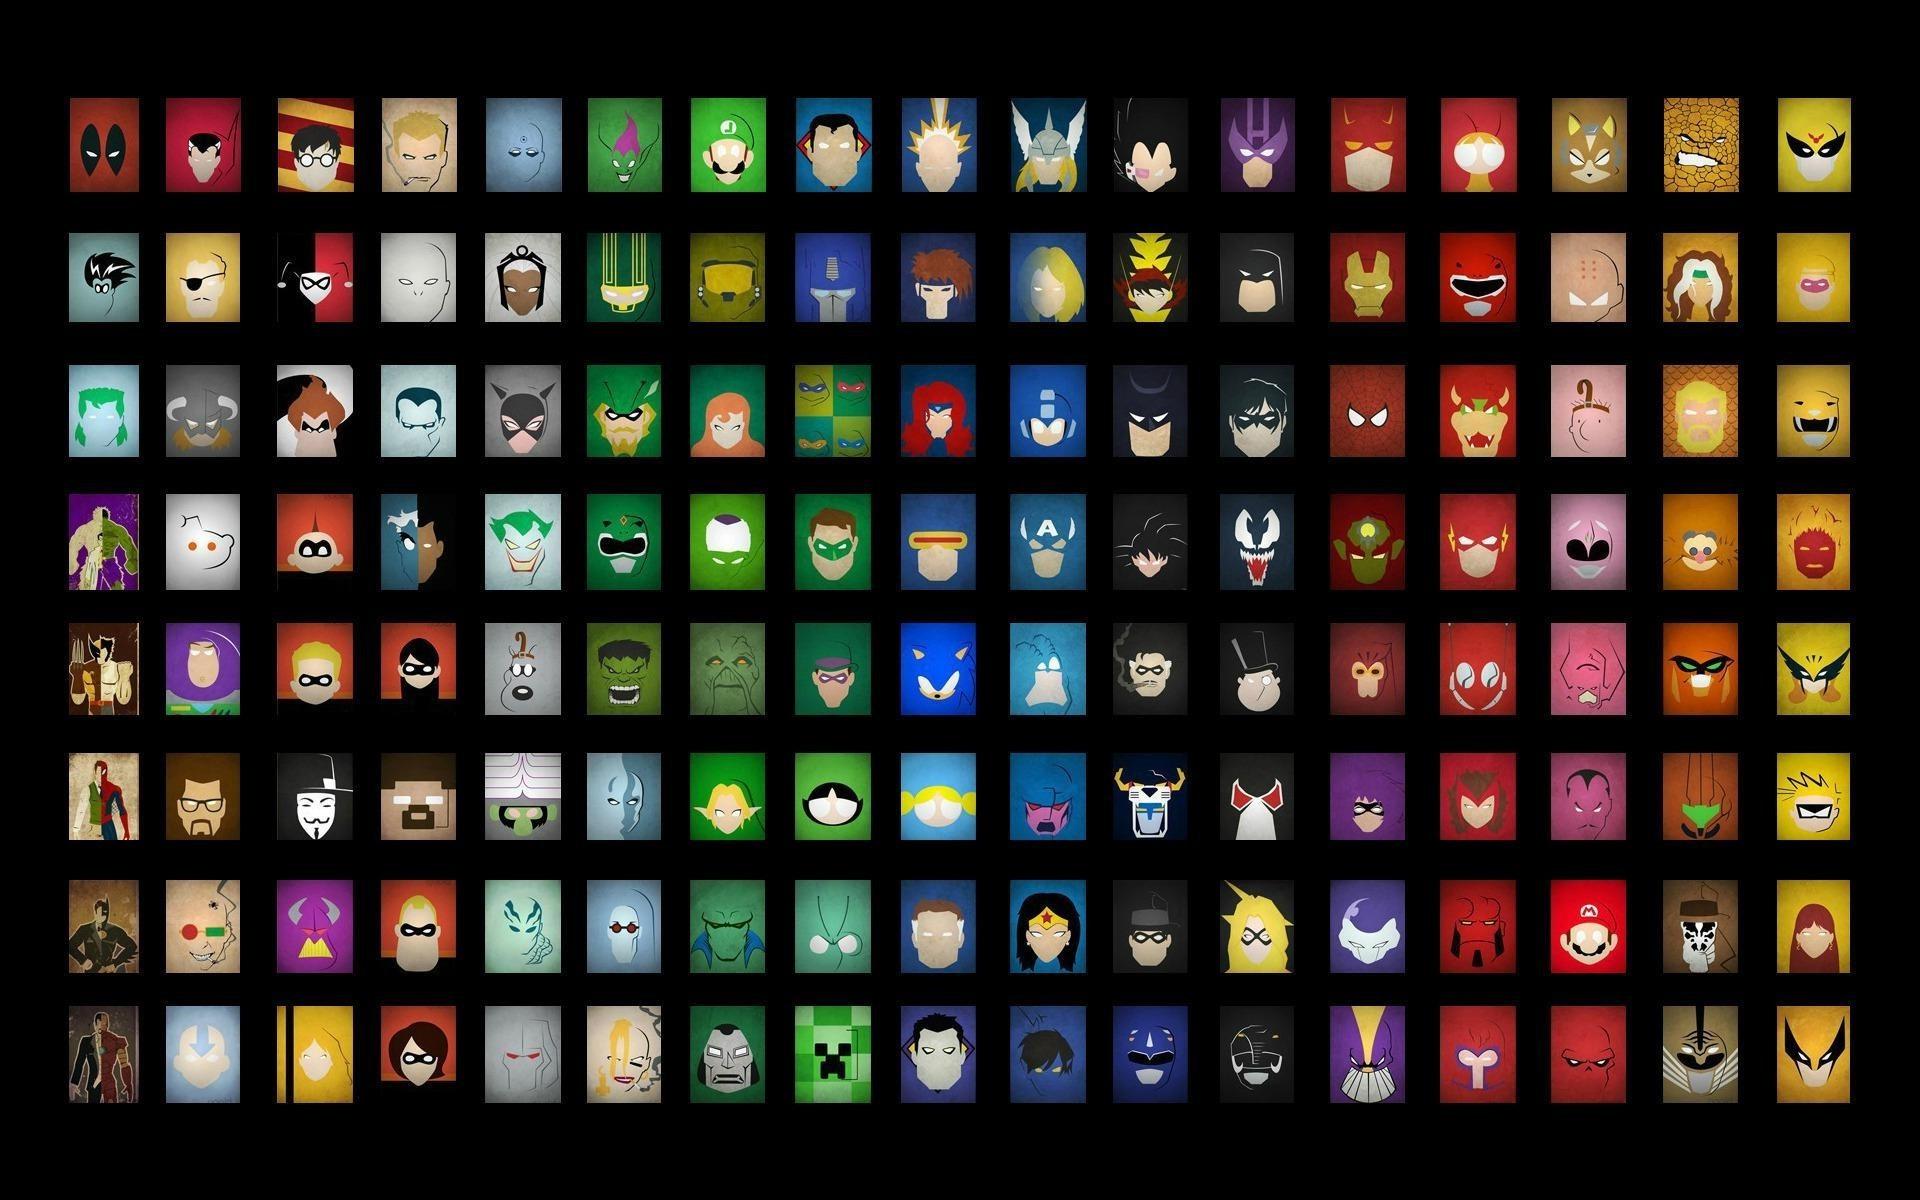 Dc marvel superheroes wallpaper 58 images 1920x1080 1920x1080 download 1920x1080 marvel heroes hd wallpapers voltagebd Images